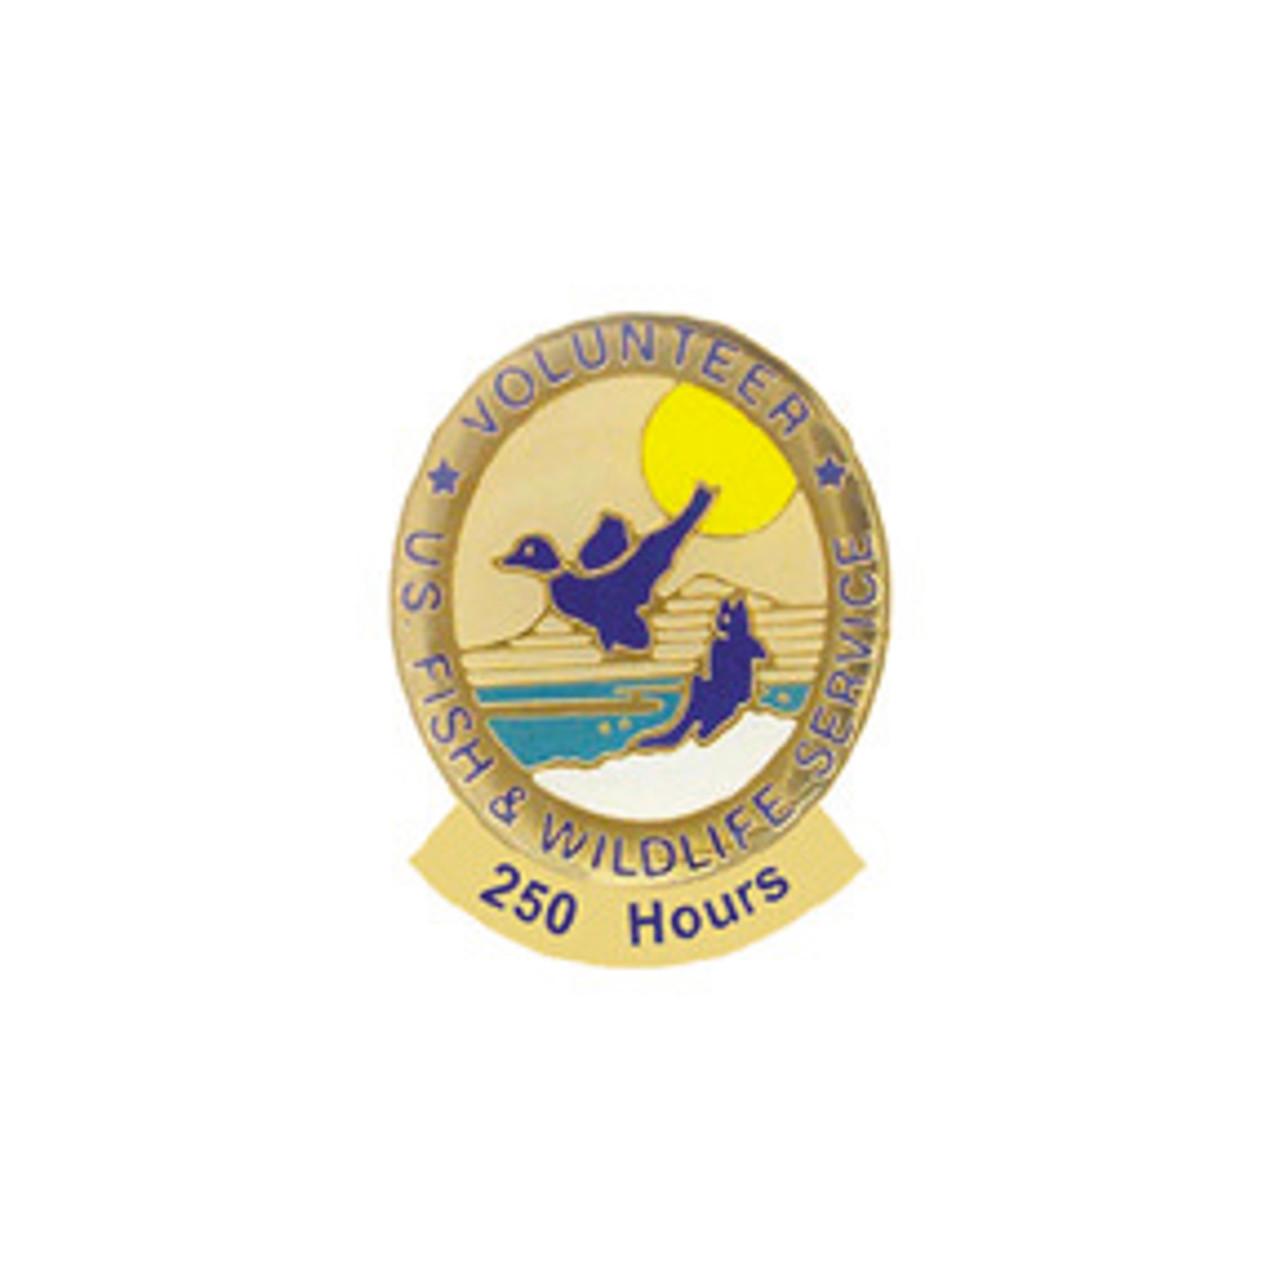 Fish & Wildlife Volunteer Hours Pin (5750 hours)